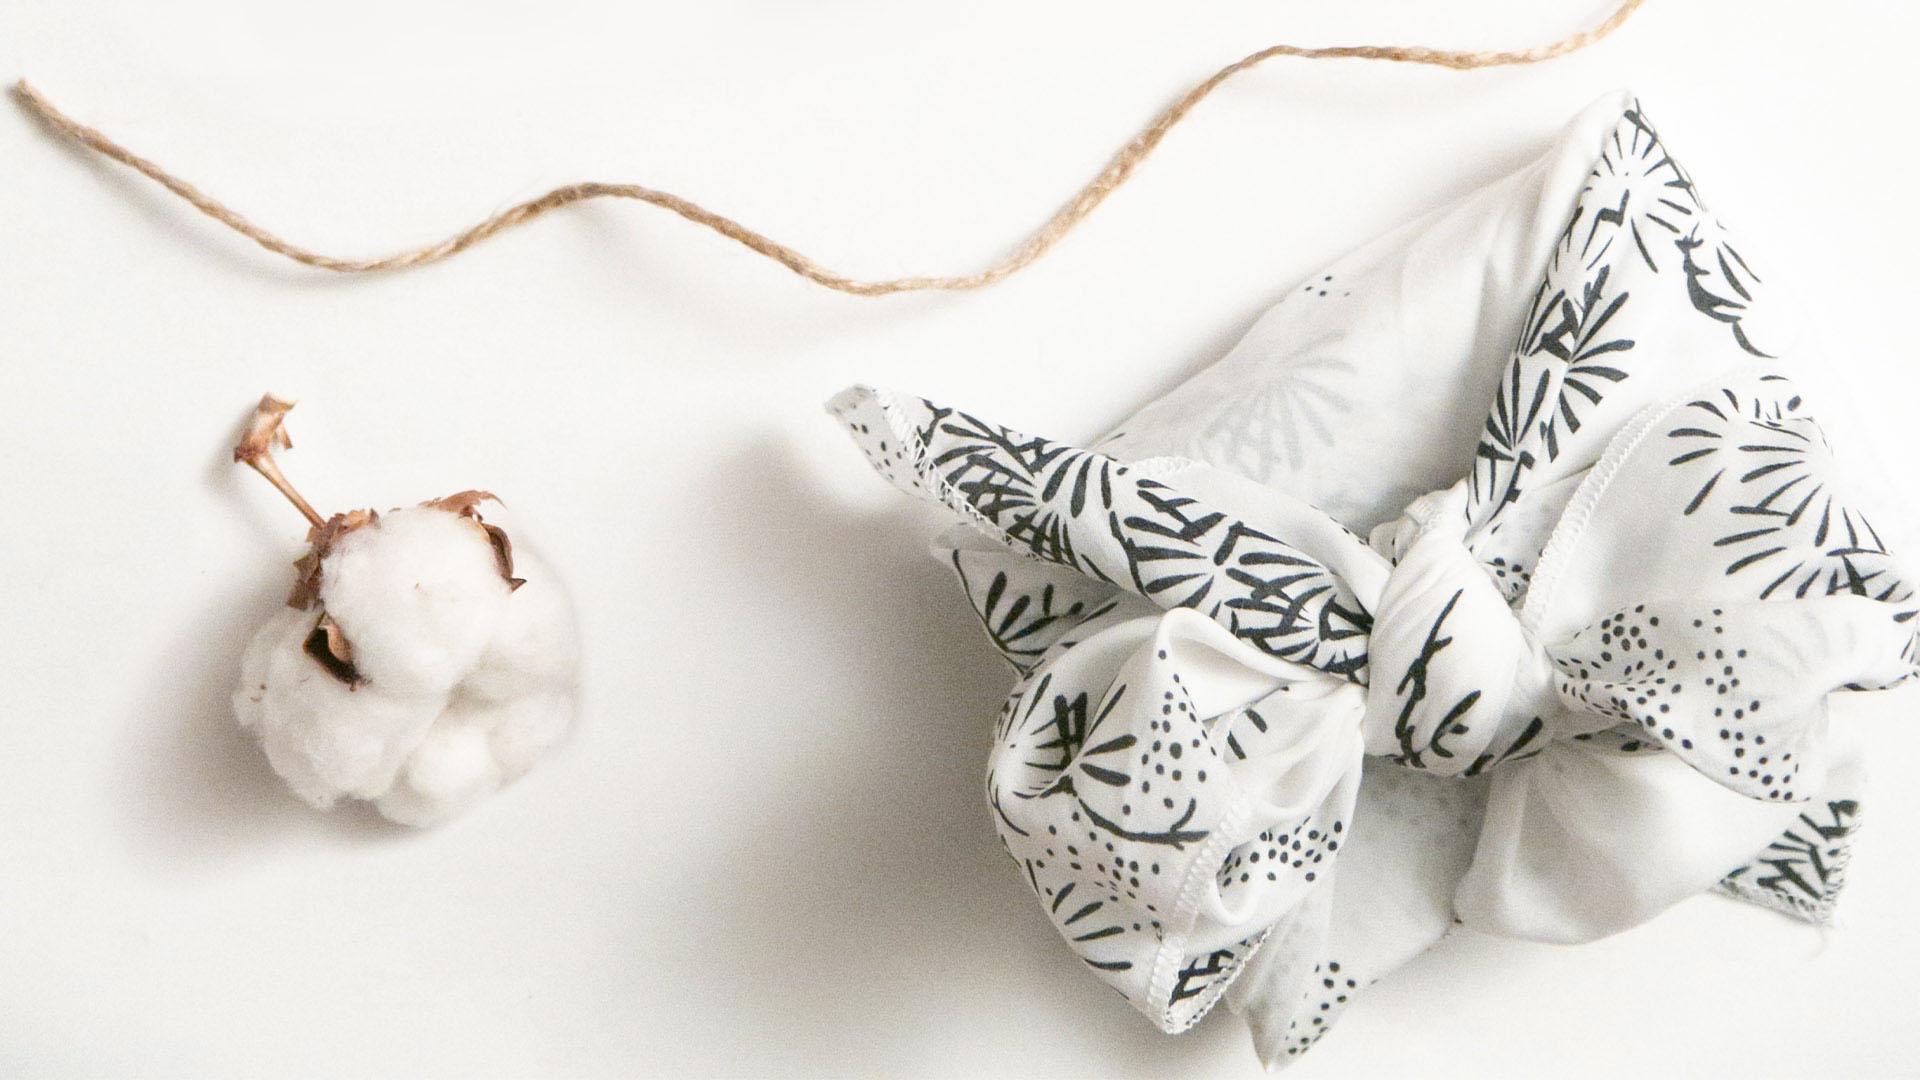 Emballage cadeau réutilisable furoshiki